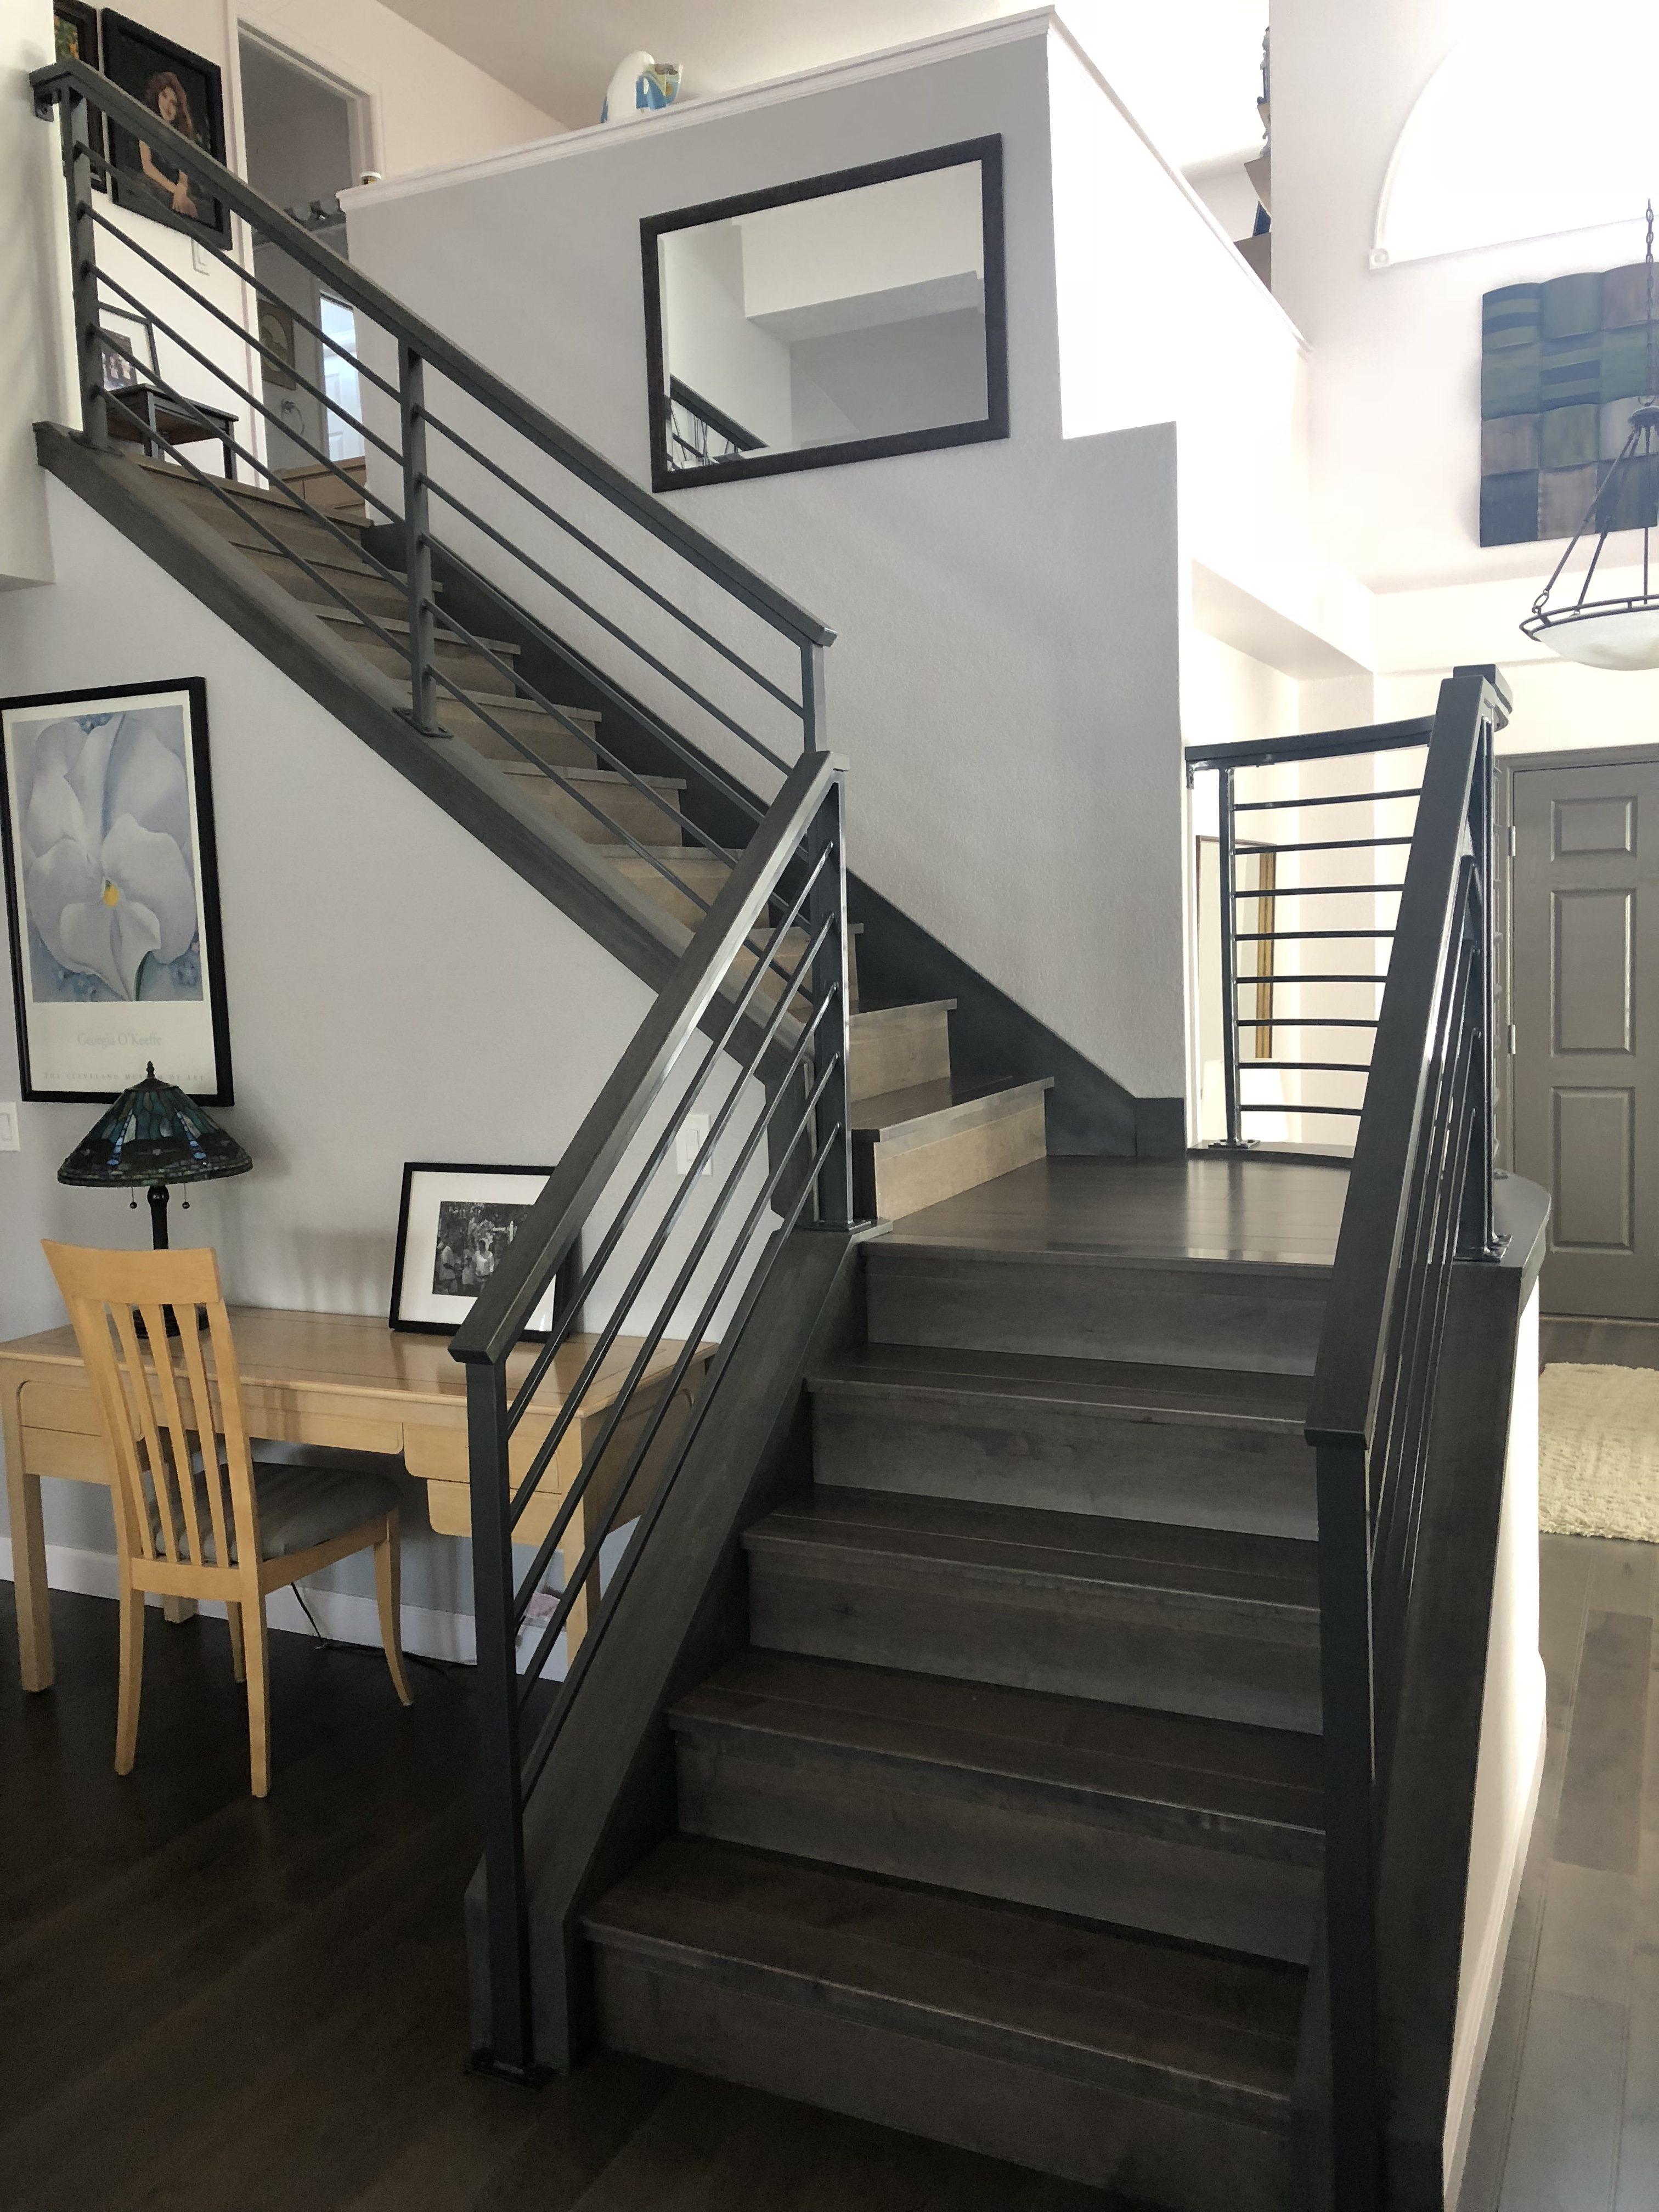 Select Wood Floors - Select Wood Floors